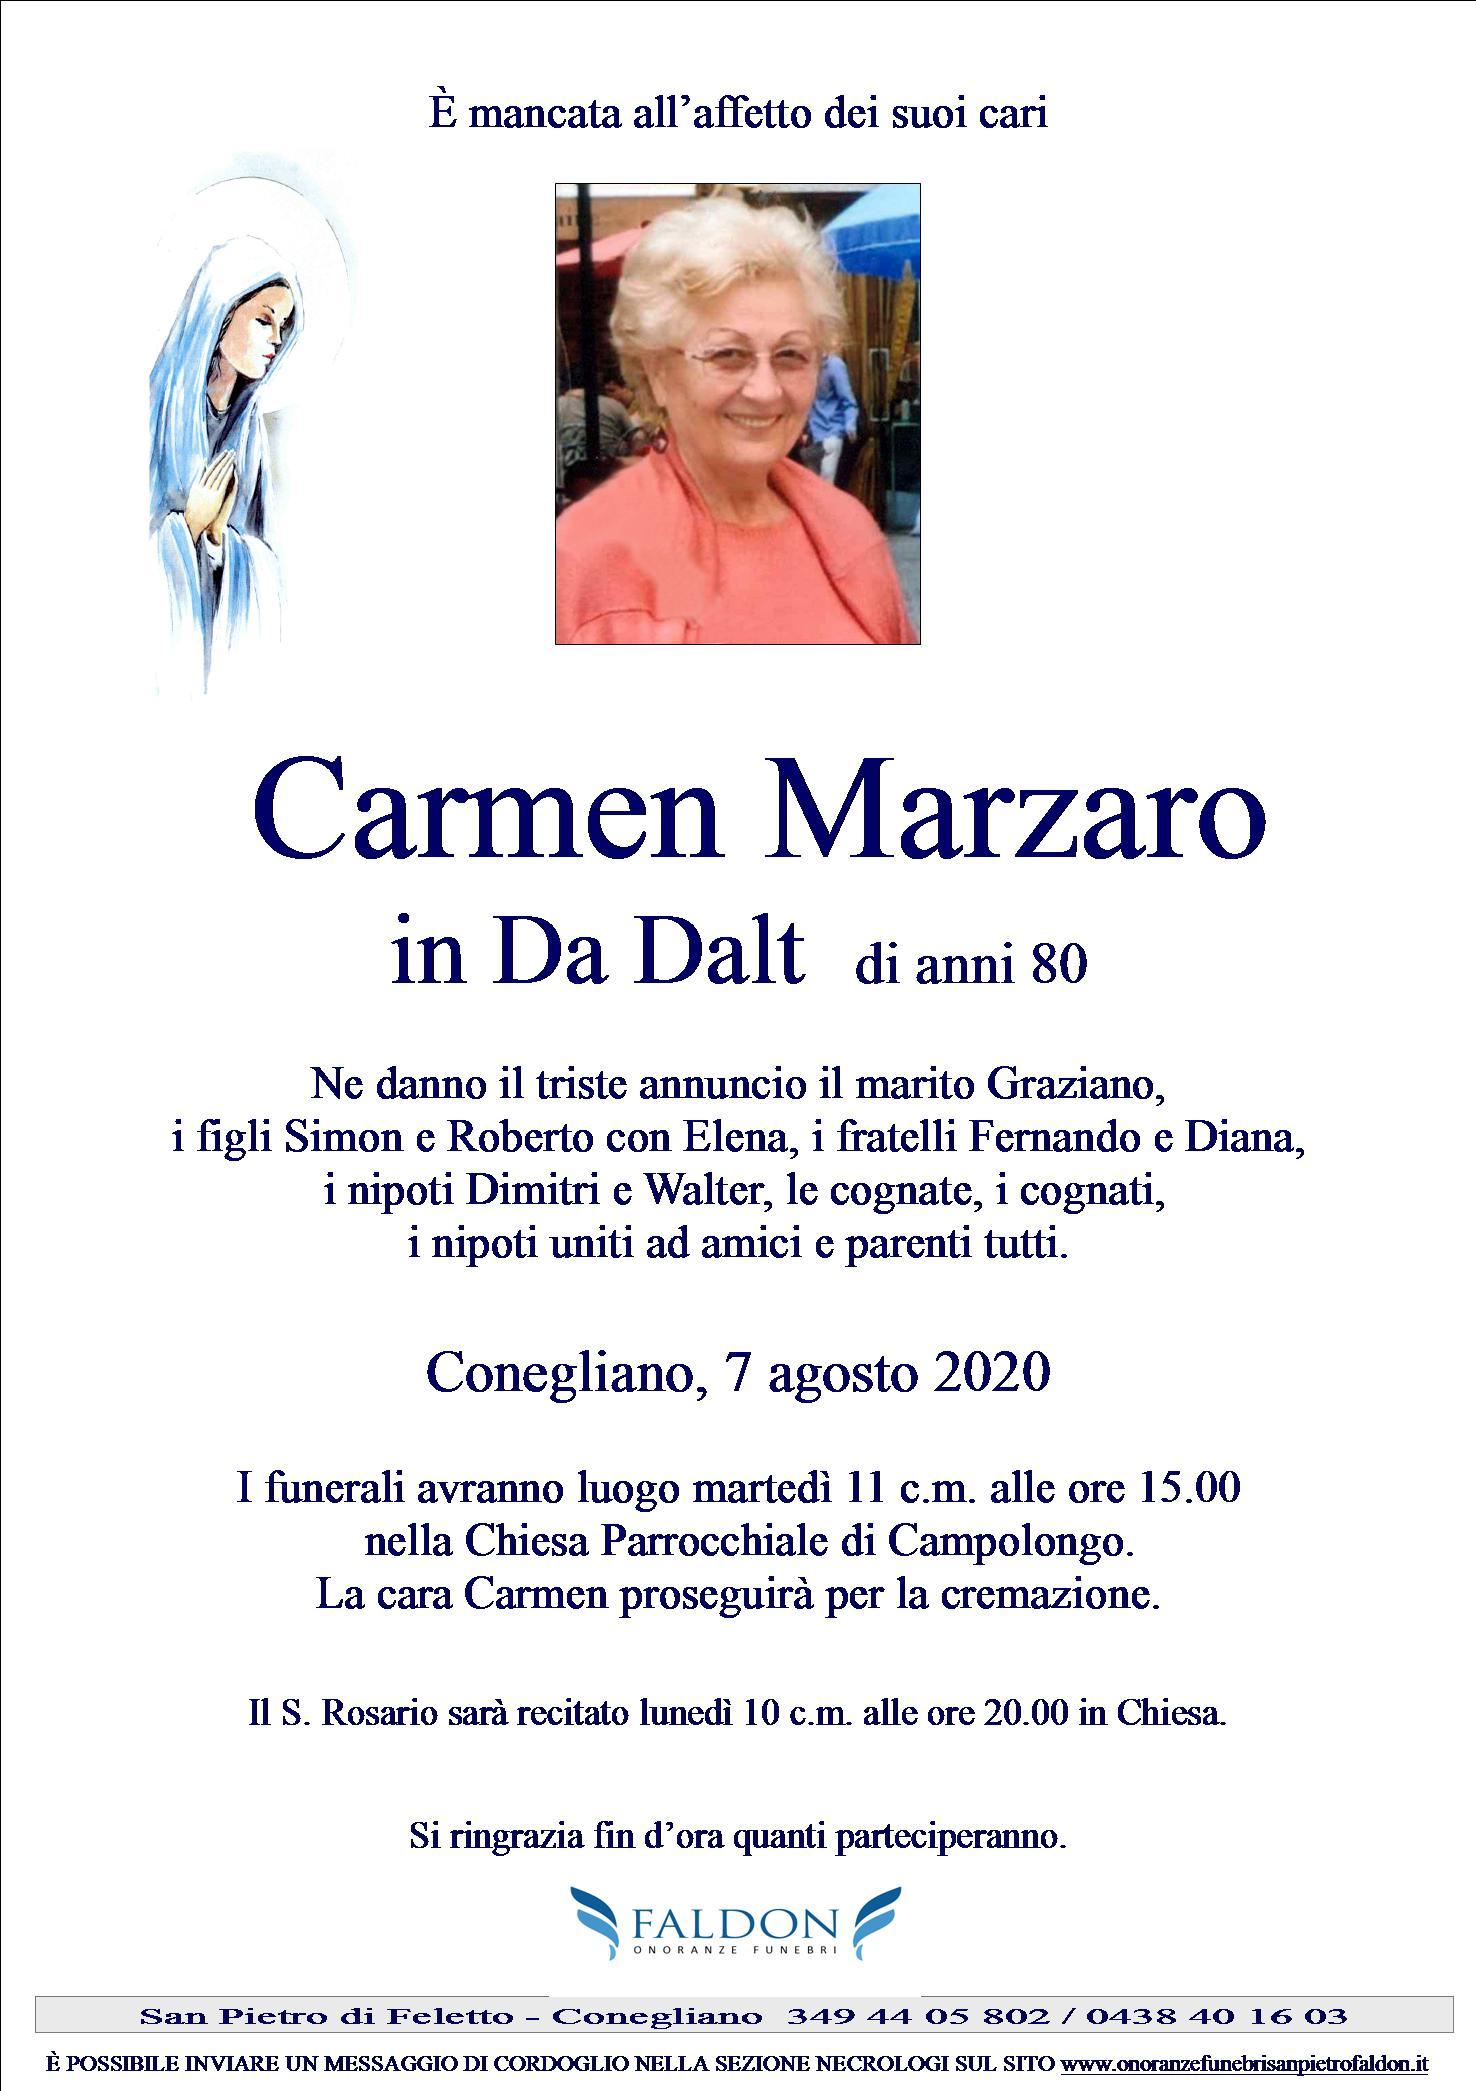 Carmen Marzaro